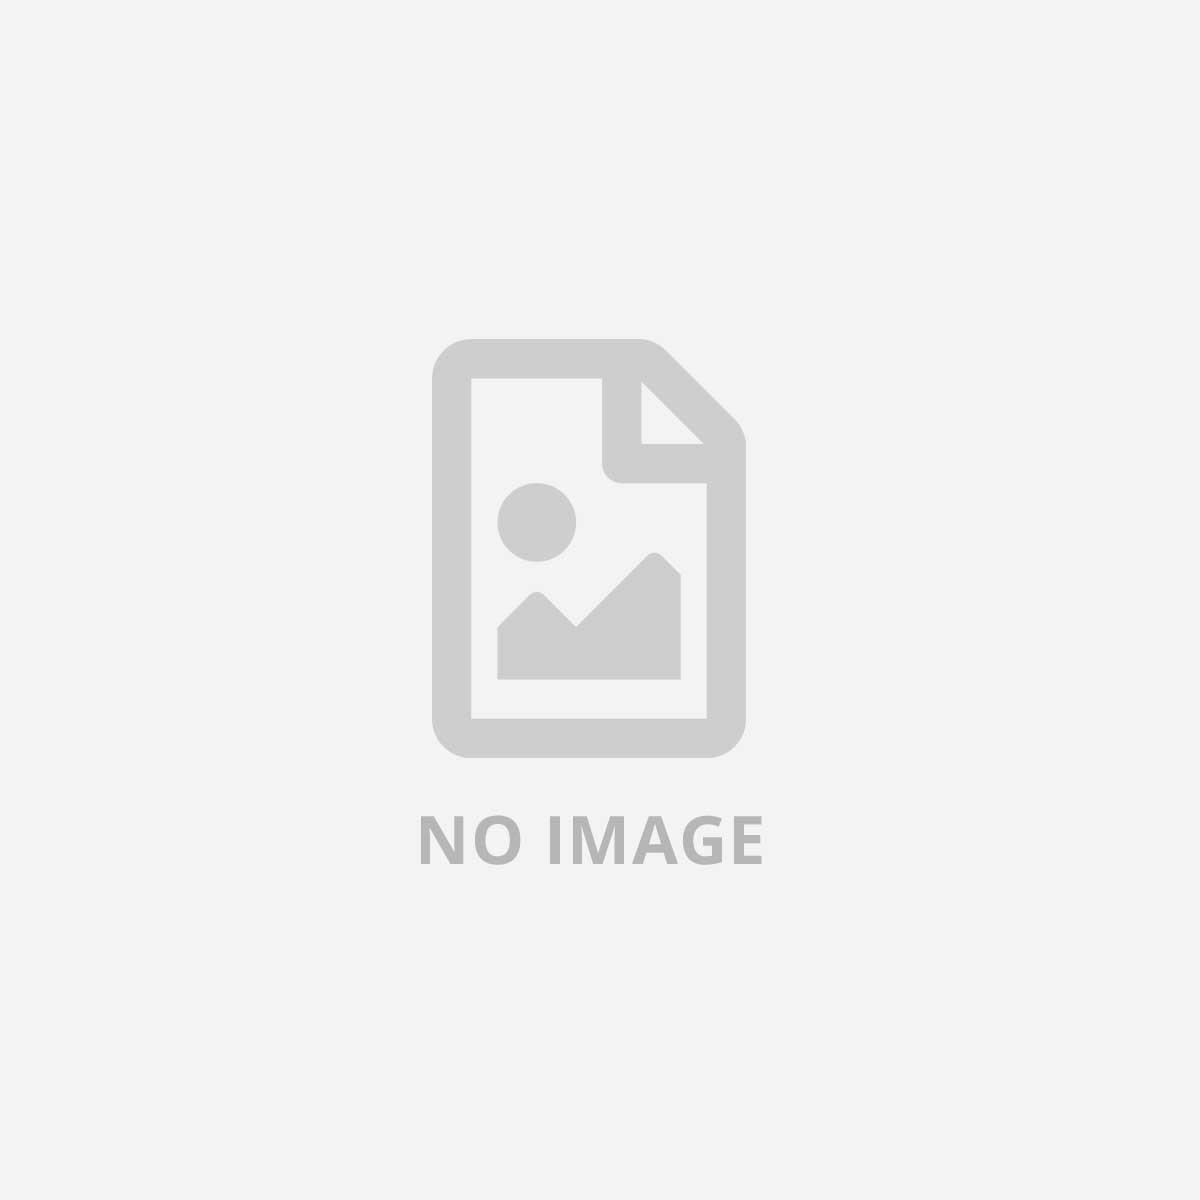 LENOVO THINKCENTRE --  256 SSD -  i5 8GB - WIN 10 PRO